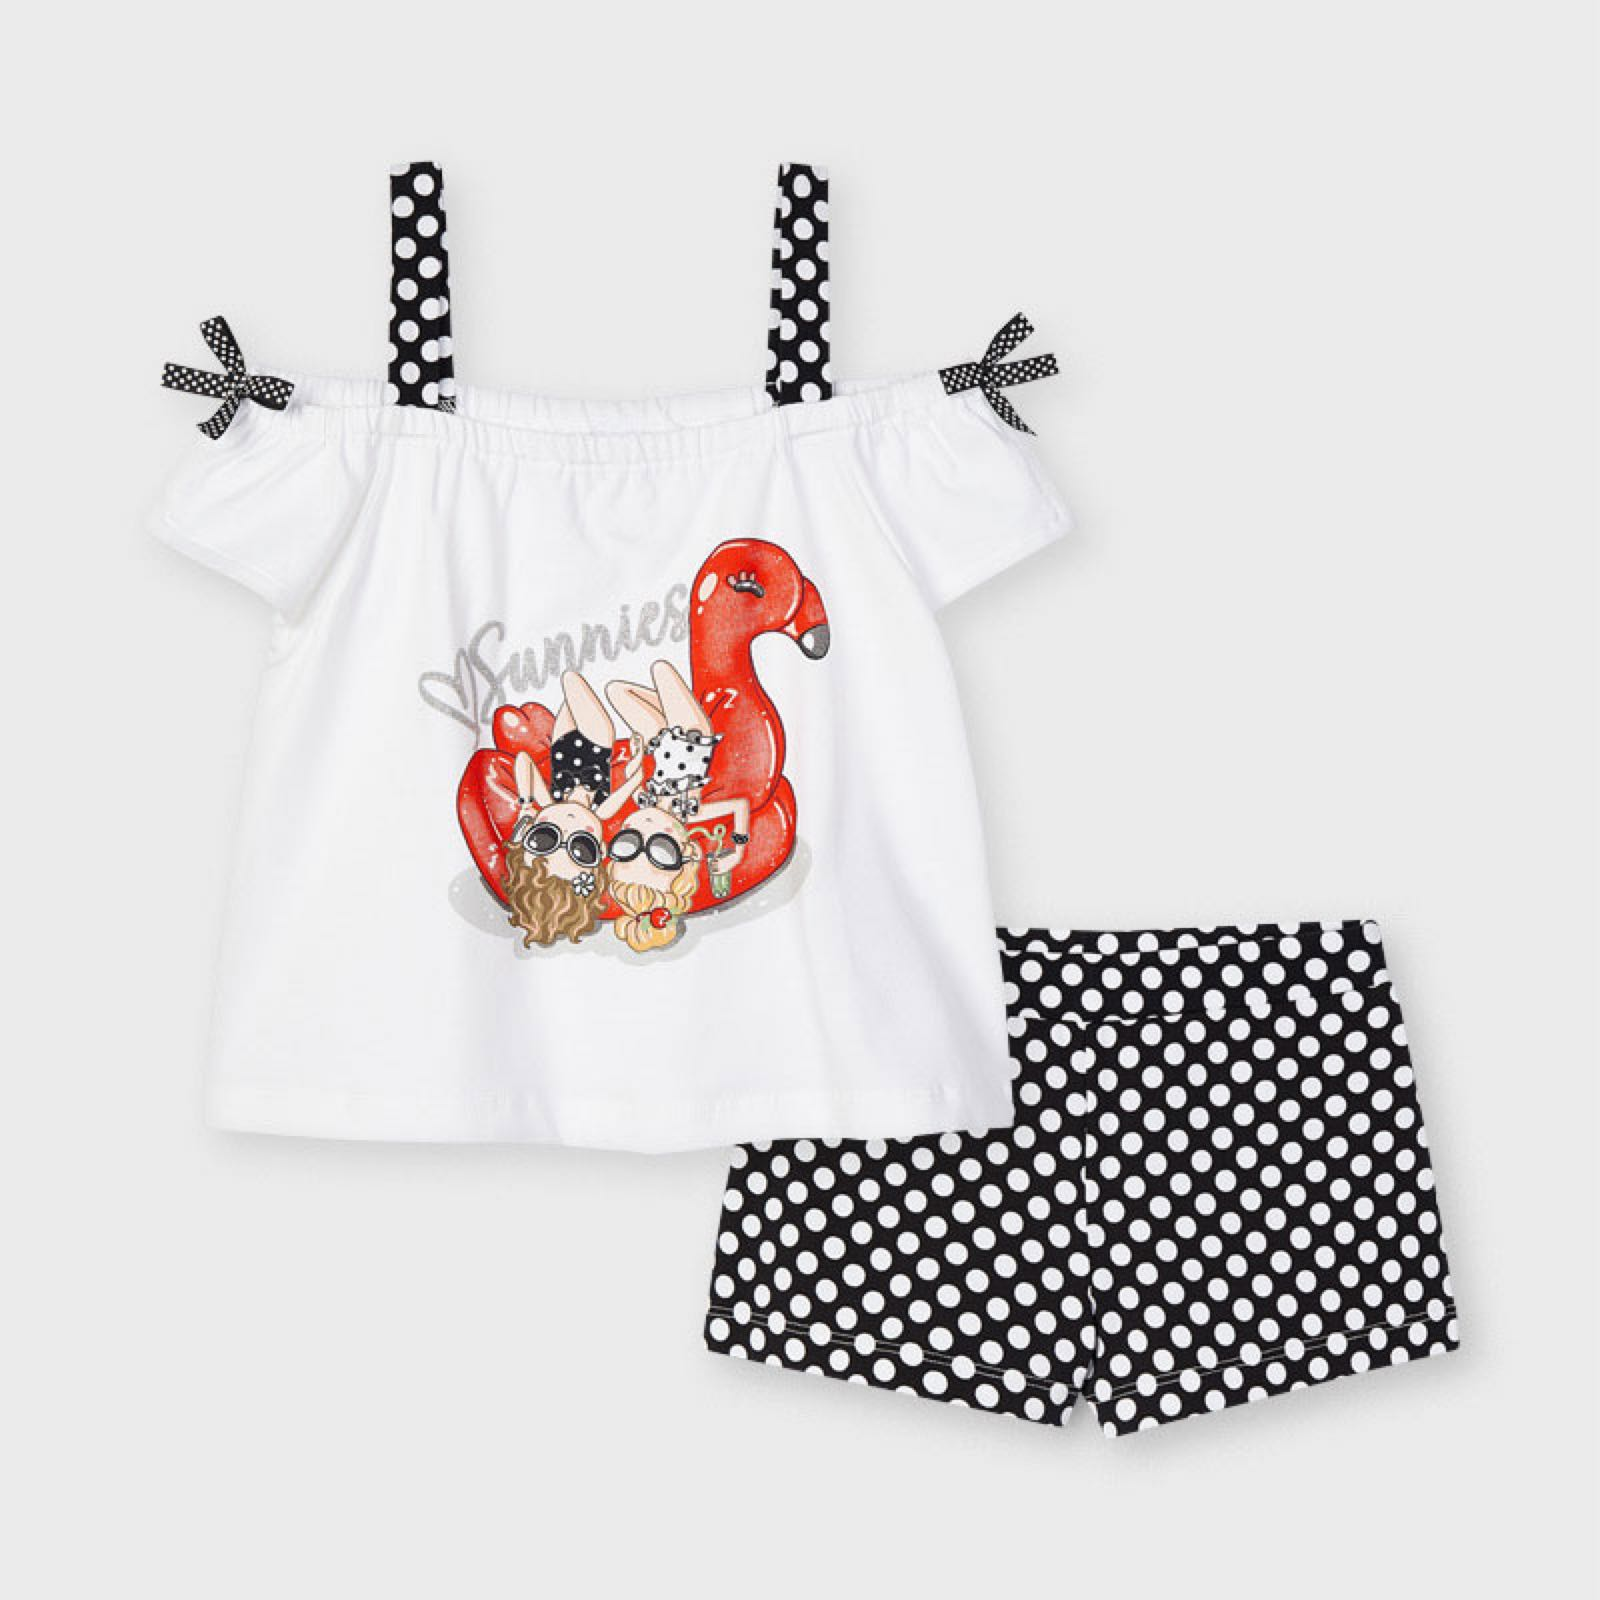 MAYORAL GIRLS Dotty Shorts with T-shirt Set 3213-53